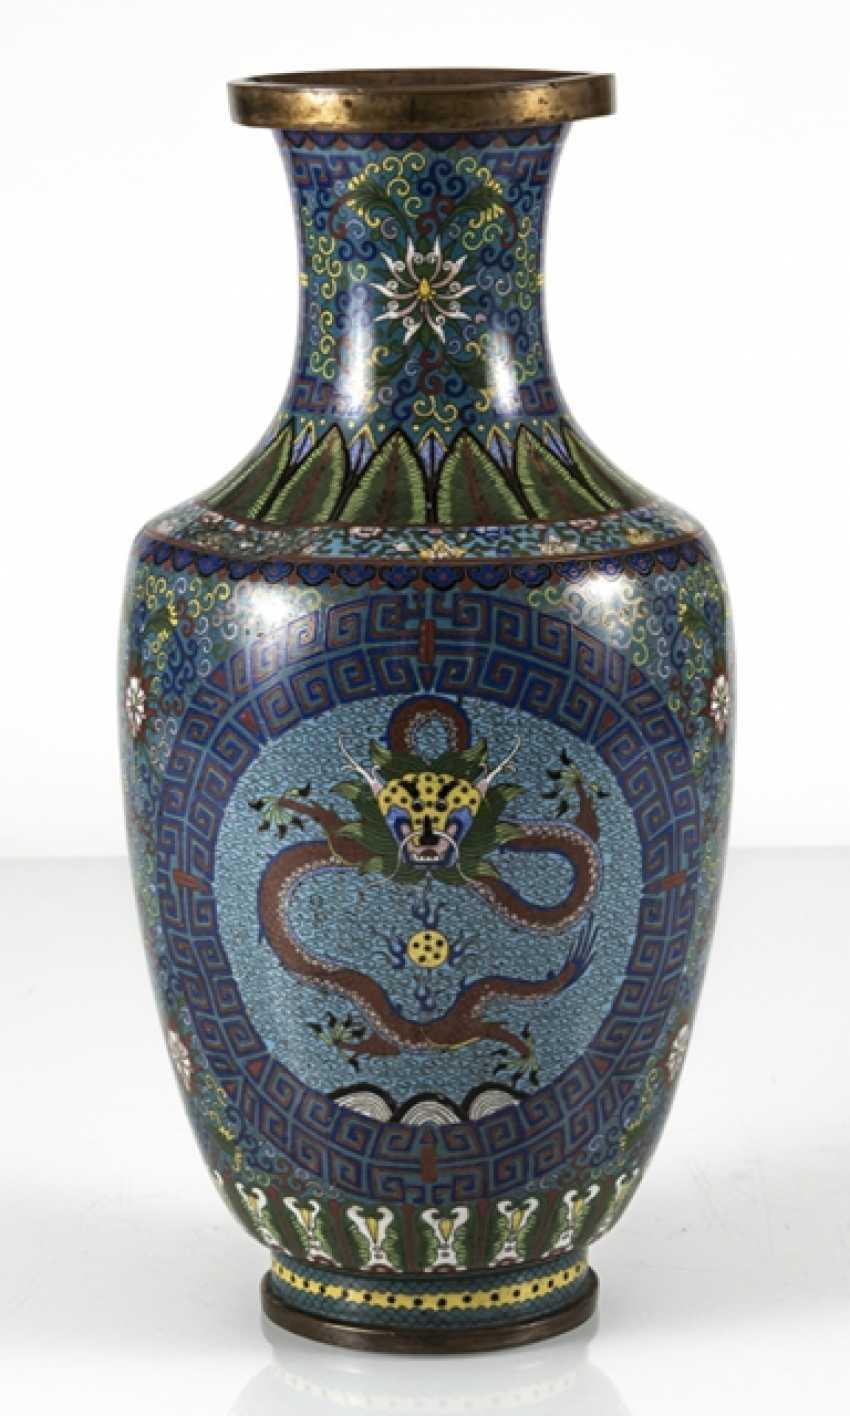 Cloisonné Vase with decorative fünfklauiger dragons in reserves, on Lotus base - photo 3